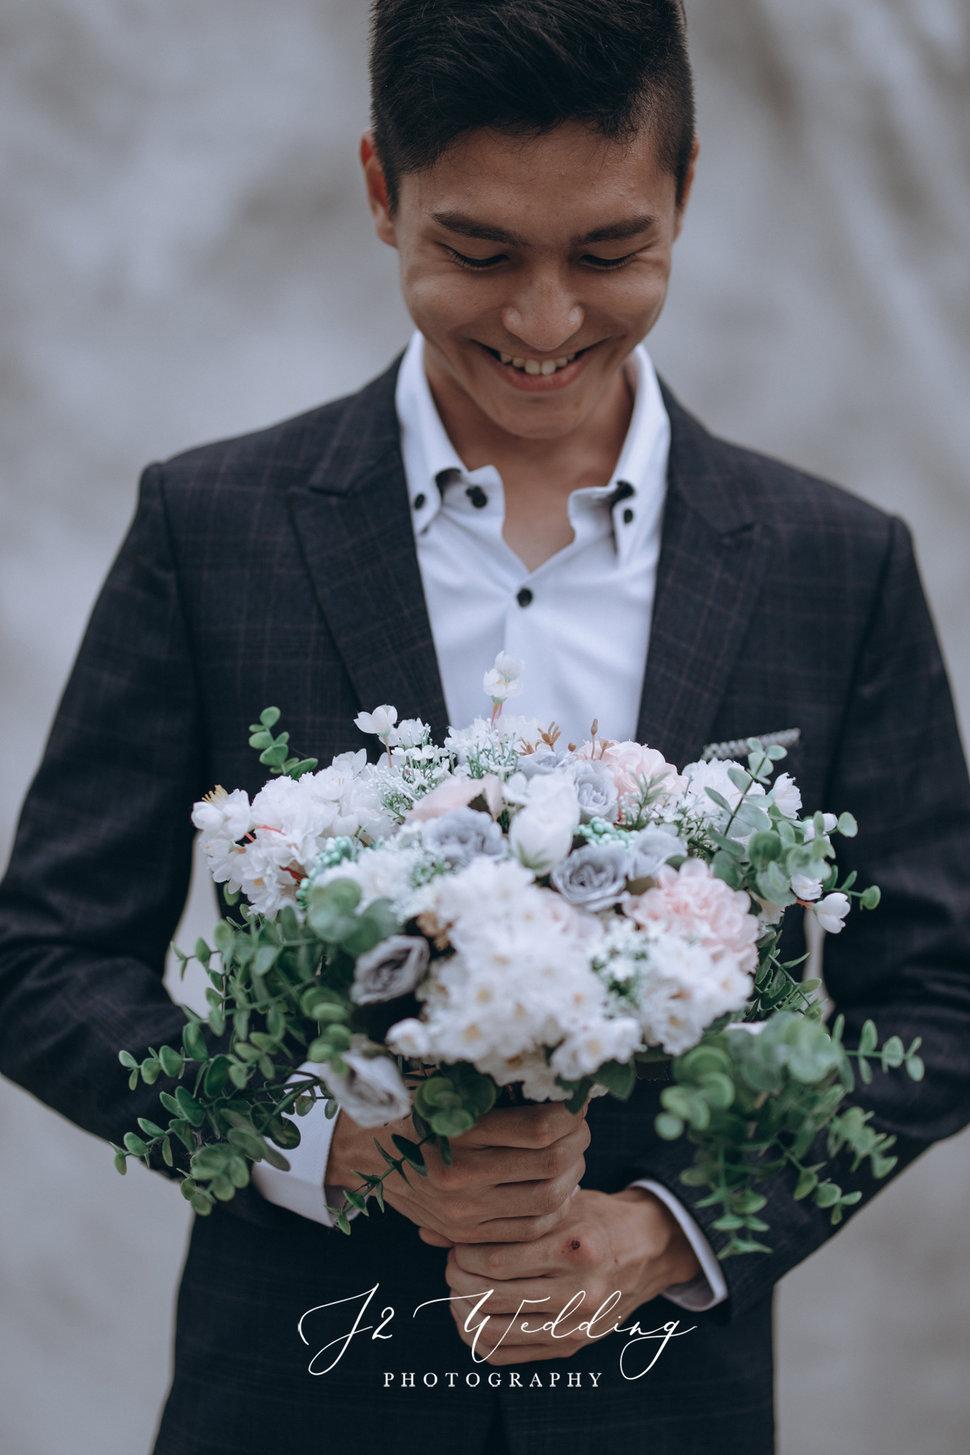 069A1240 - J2 wedding 中壢《結婚吧》